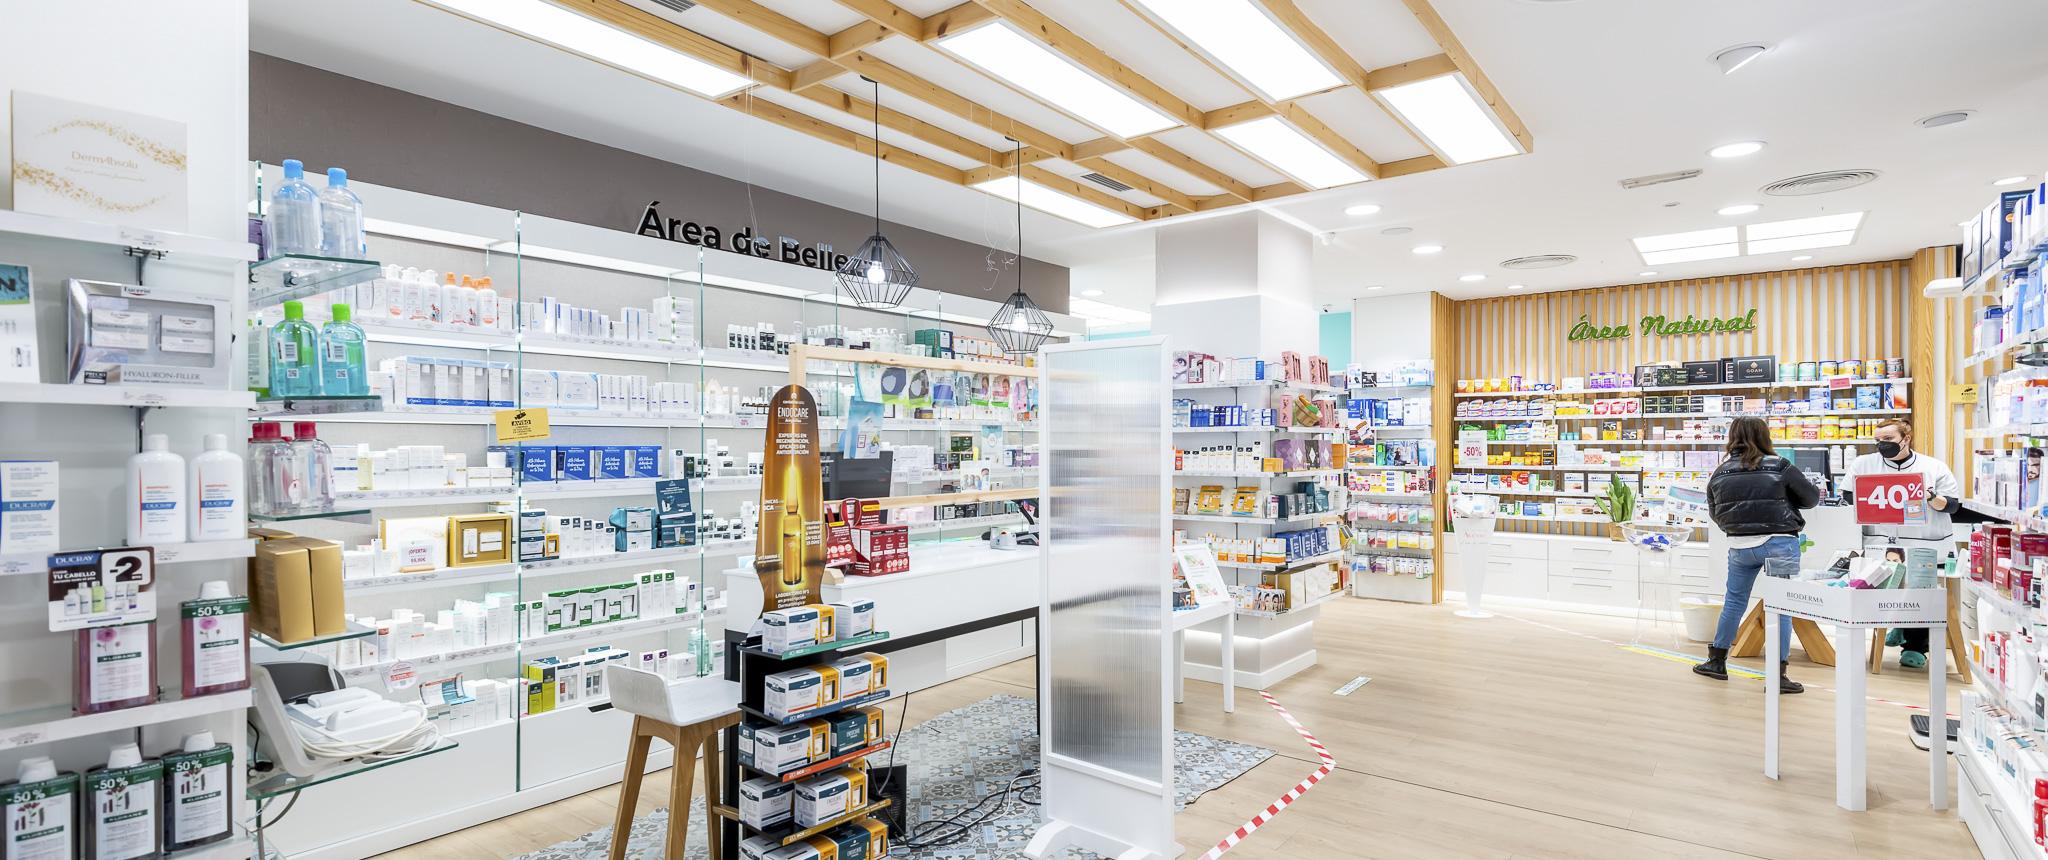 farmacia aragonia